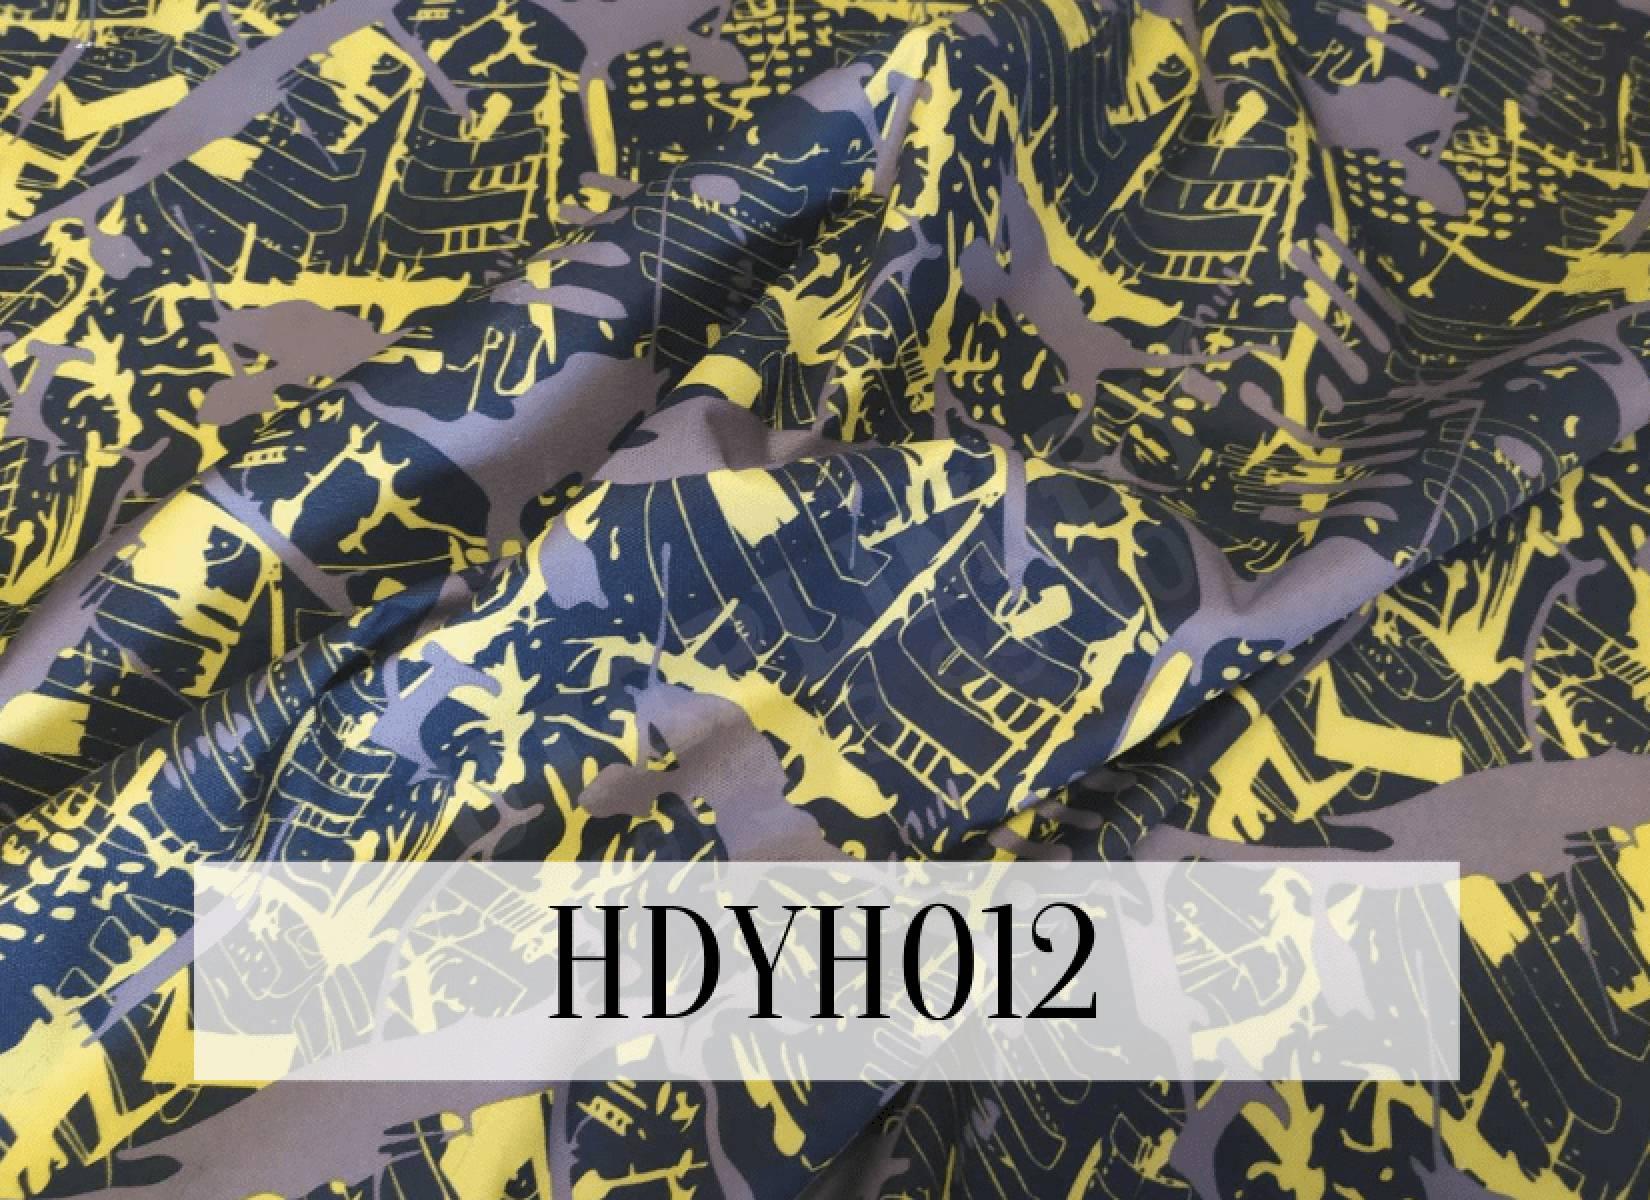 600д - HDYH 012